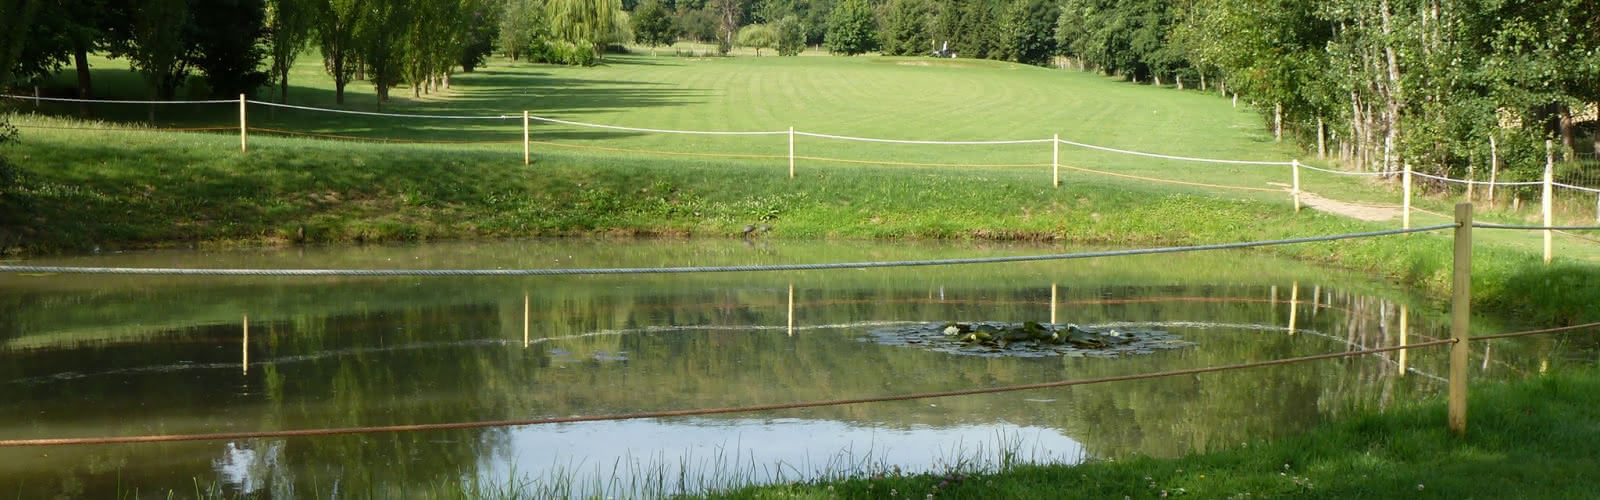 Golf d'Ecancourt